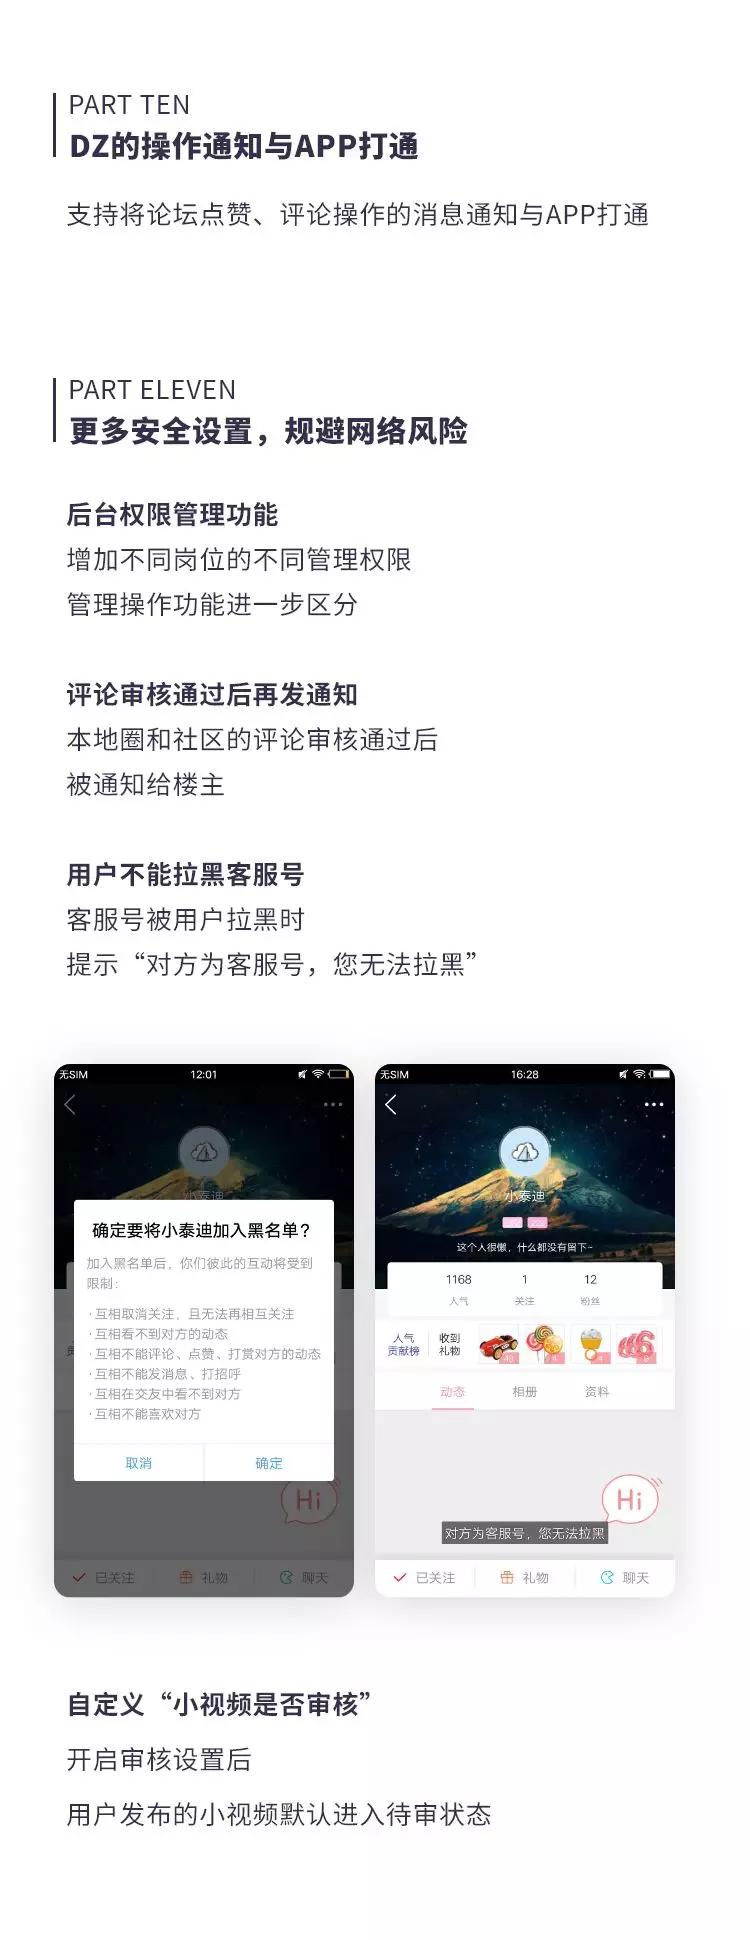 QQ图片20181017134455.png